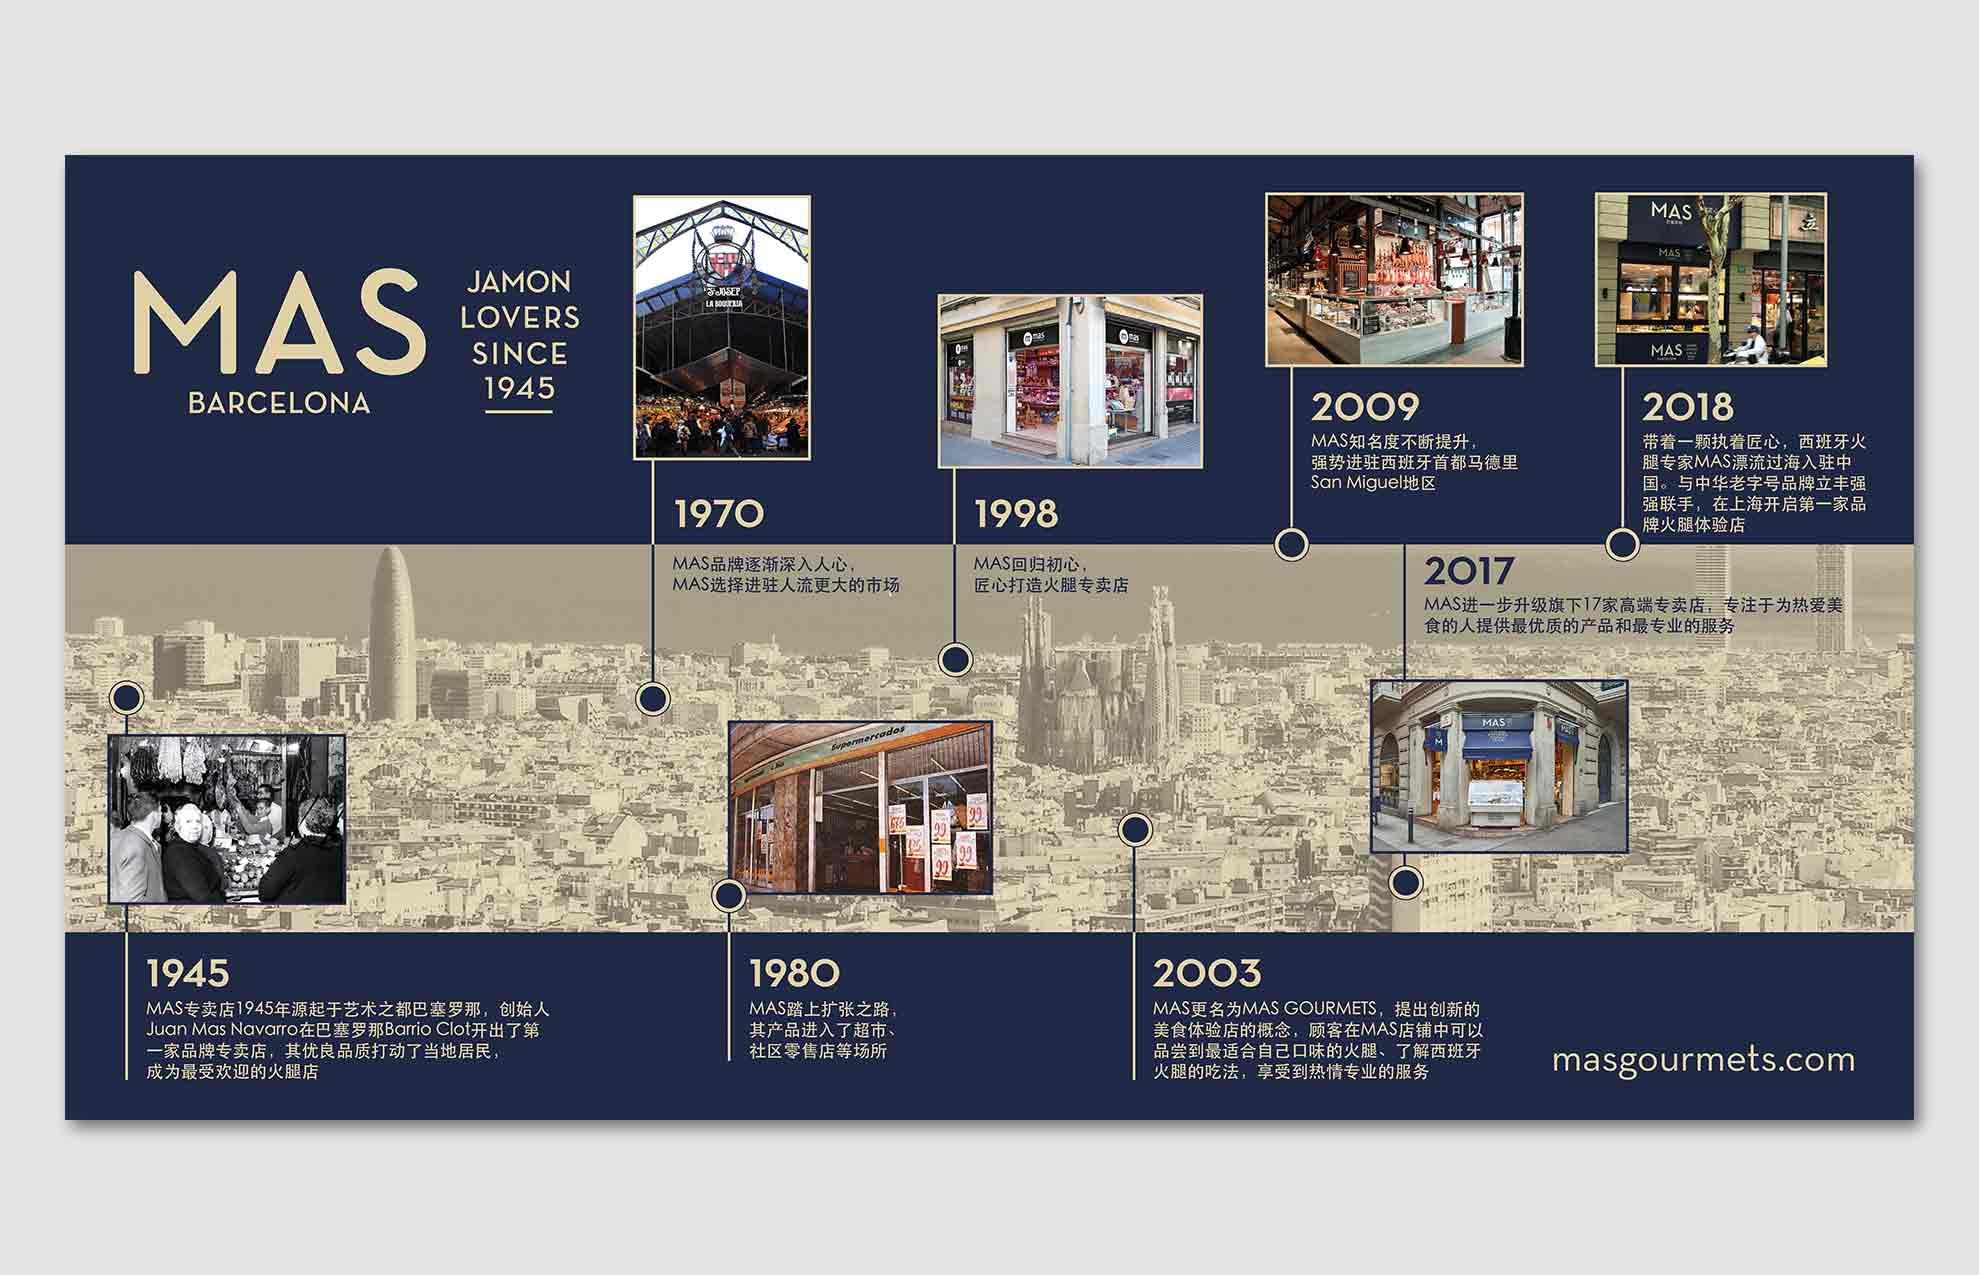 corporate graphic design china restaurant 1 - Estrategia en branding y comunicación comercial para exportar a China